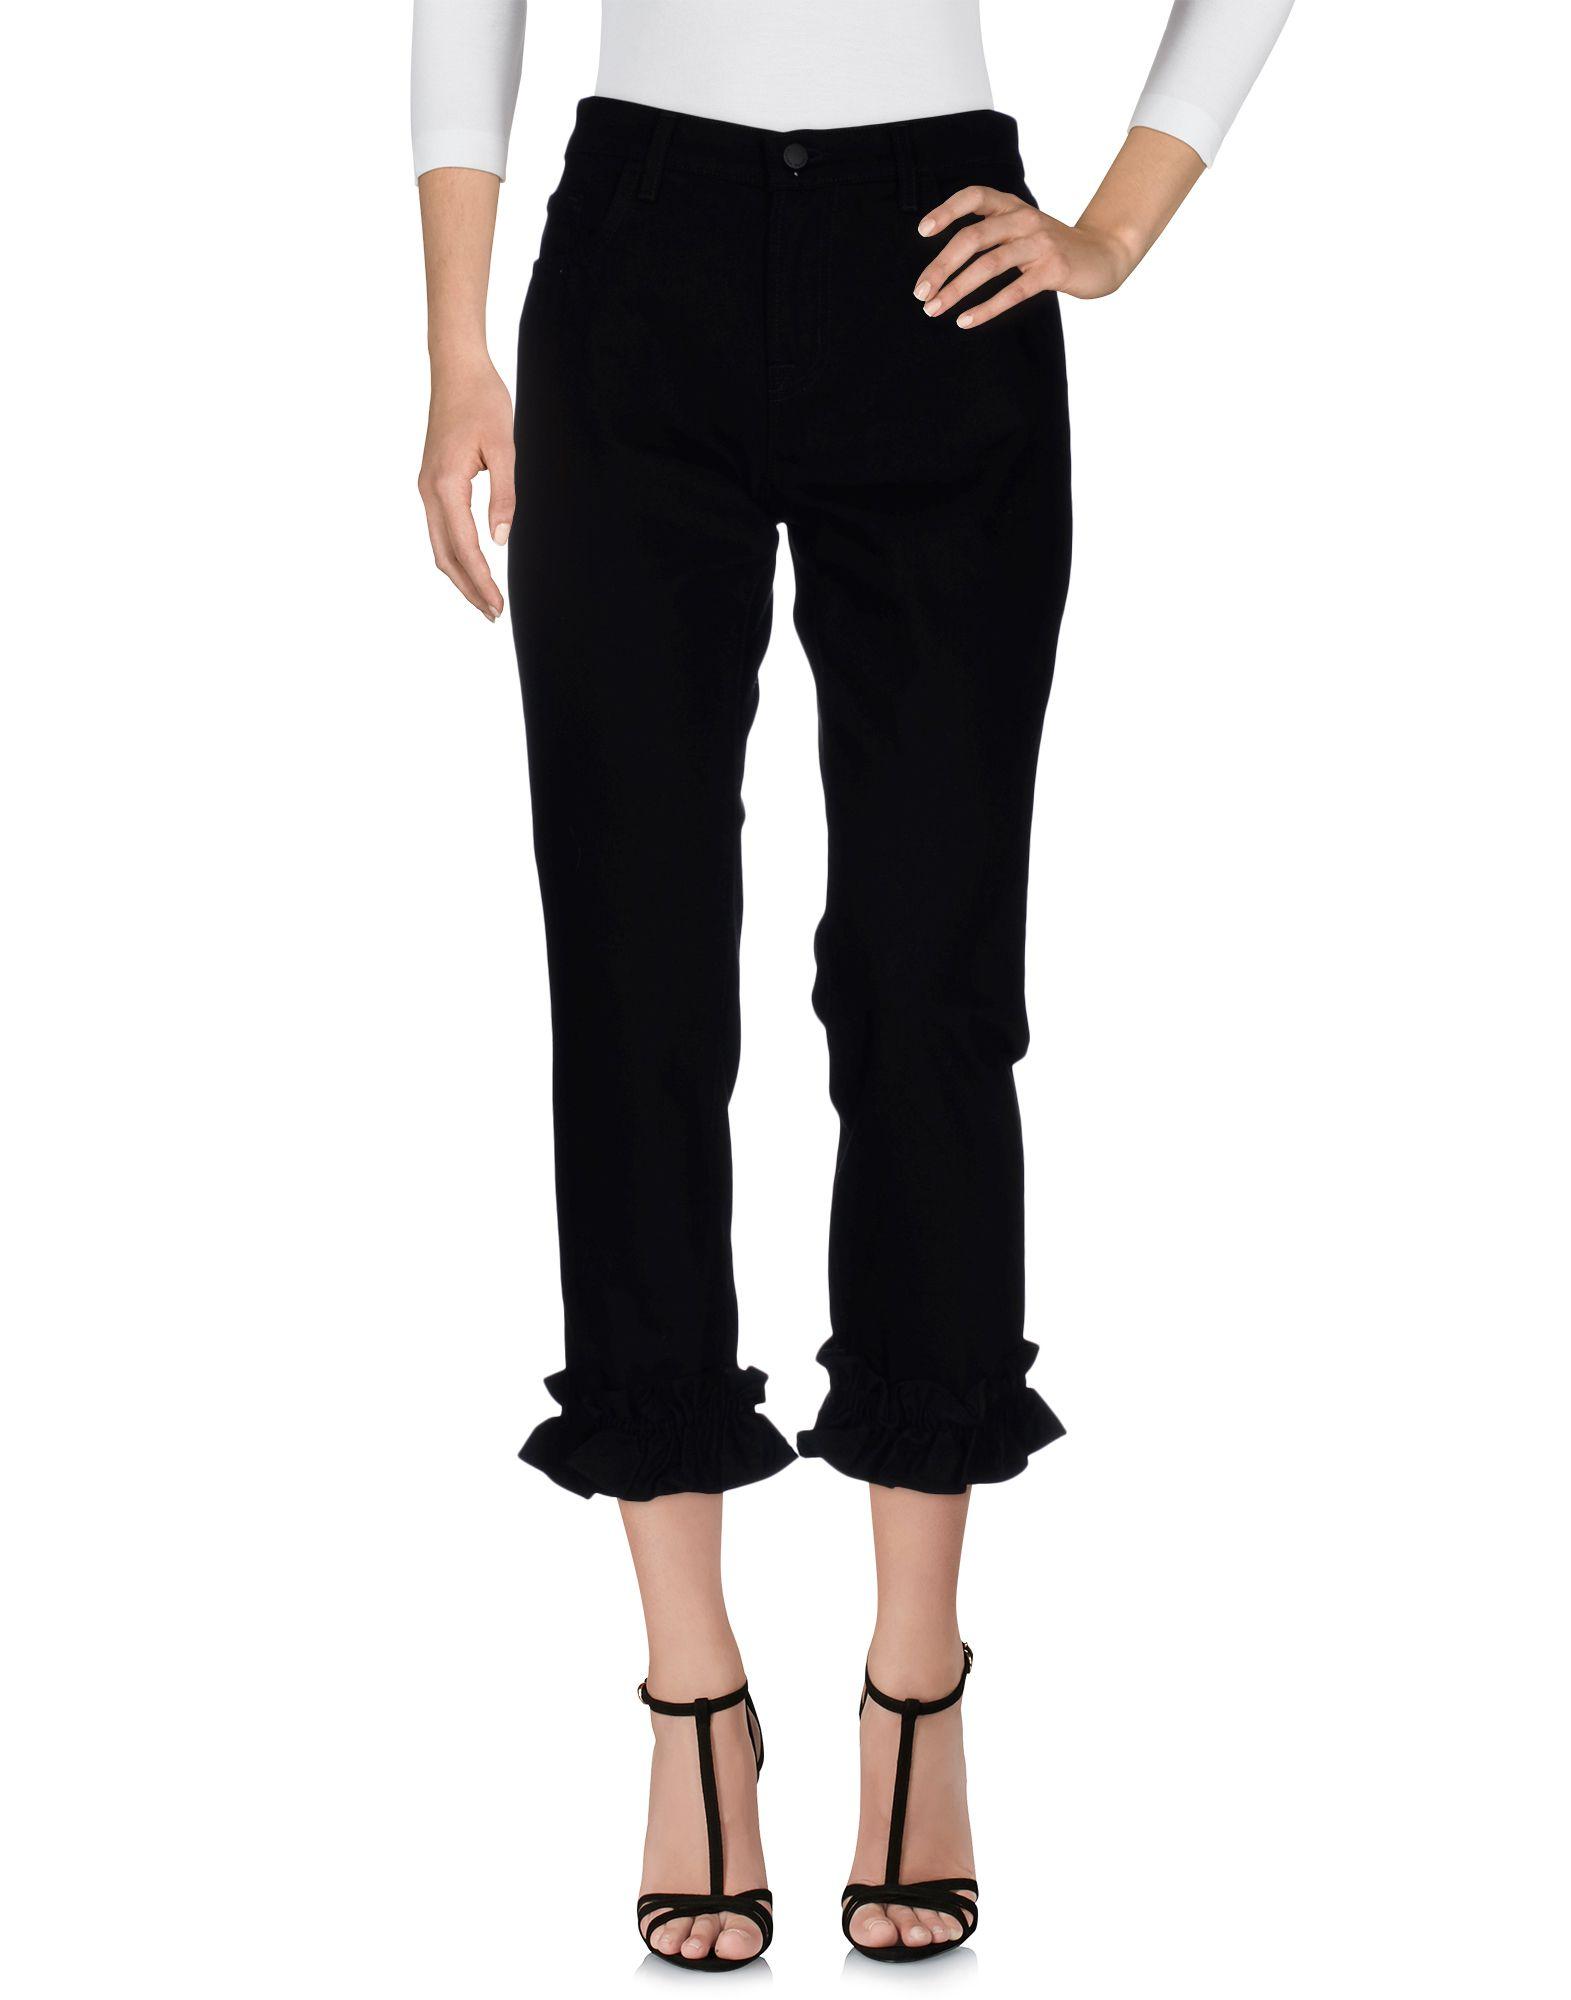 SIMONE ROCHA X J BRAND Denim Pants in Black